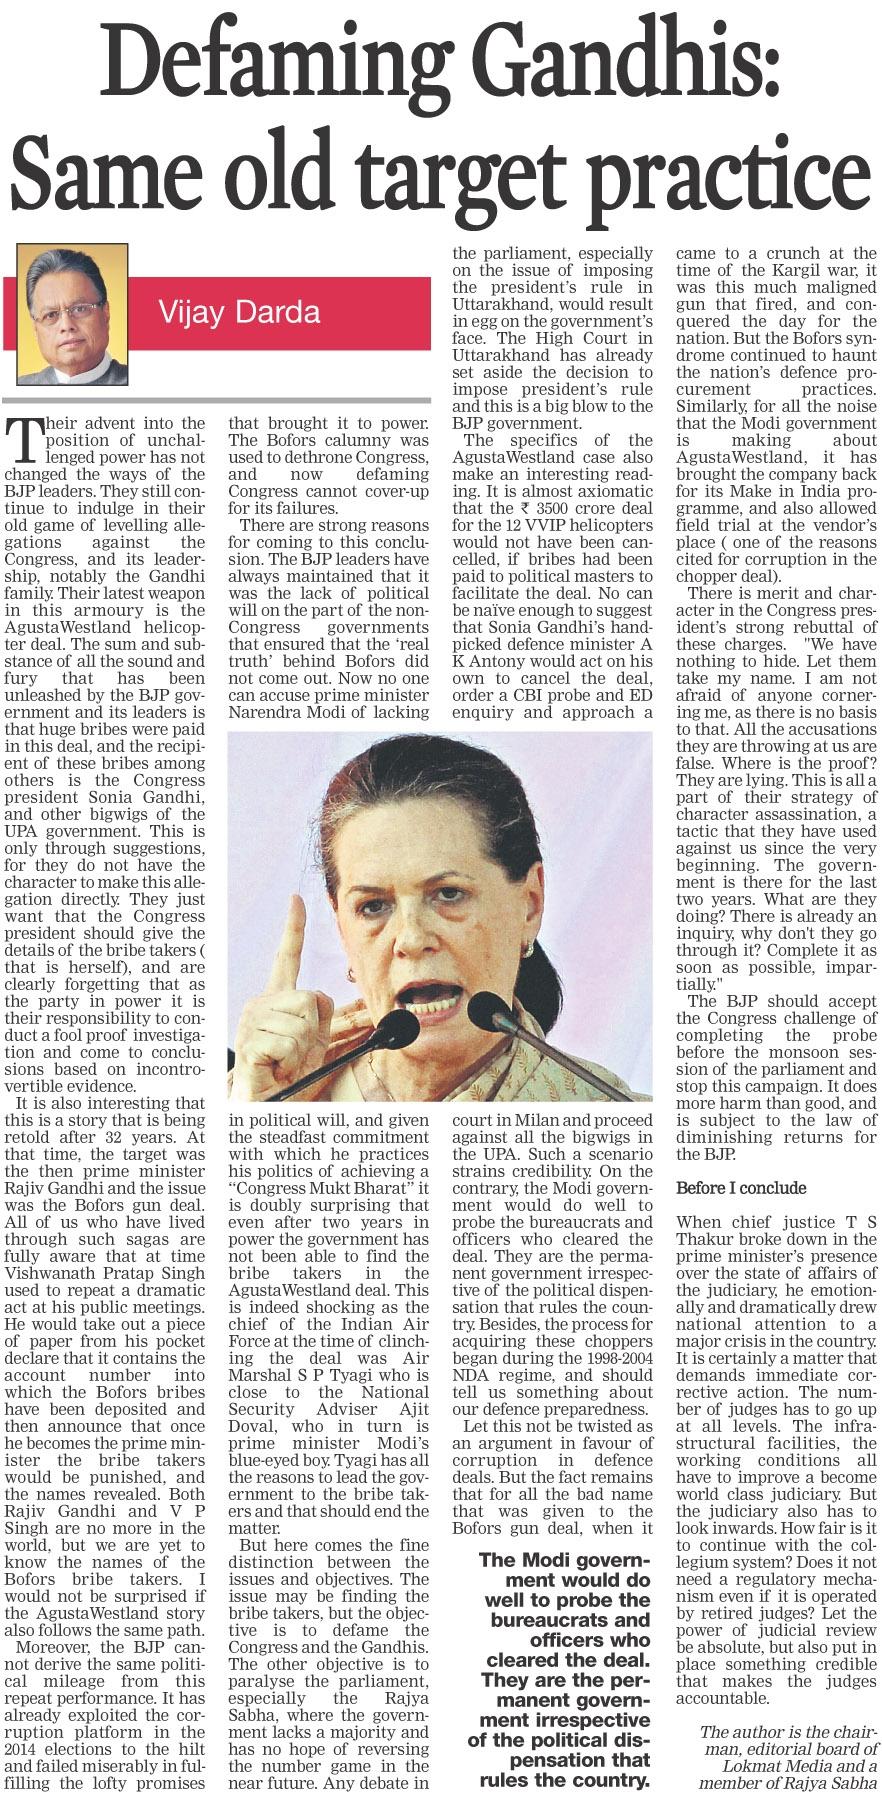 Defaming Gandhis: Same old target practice